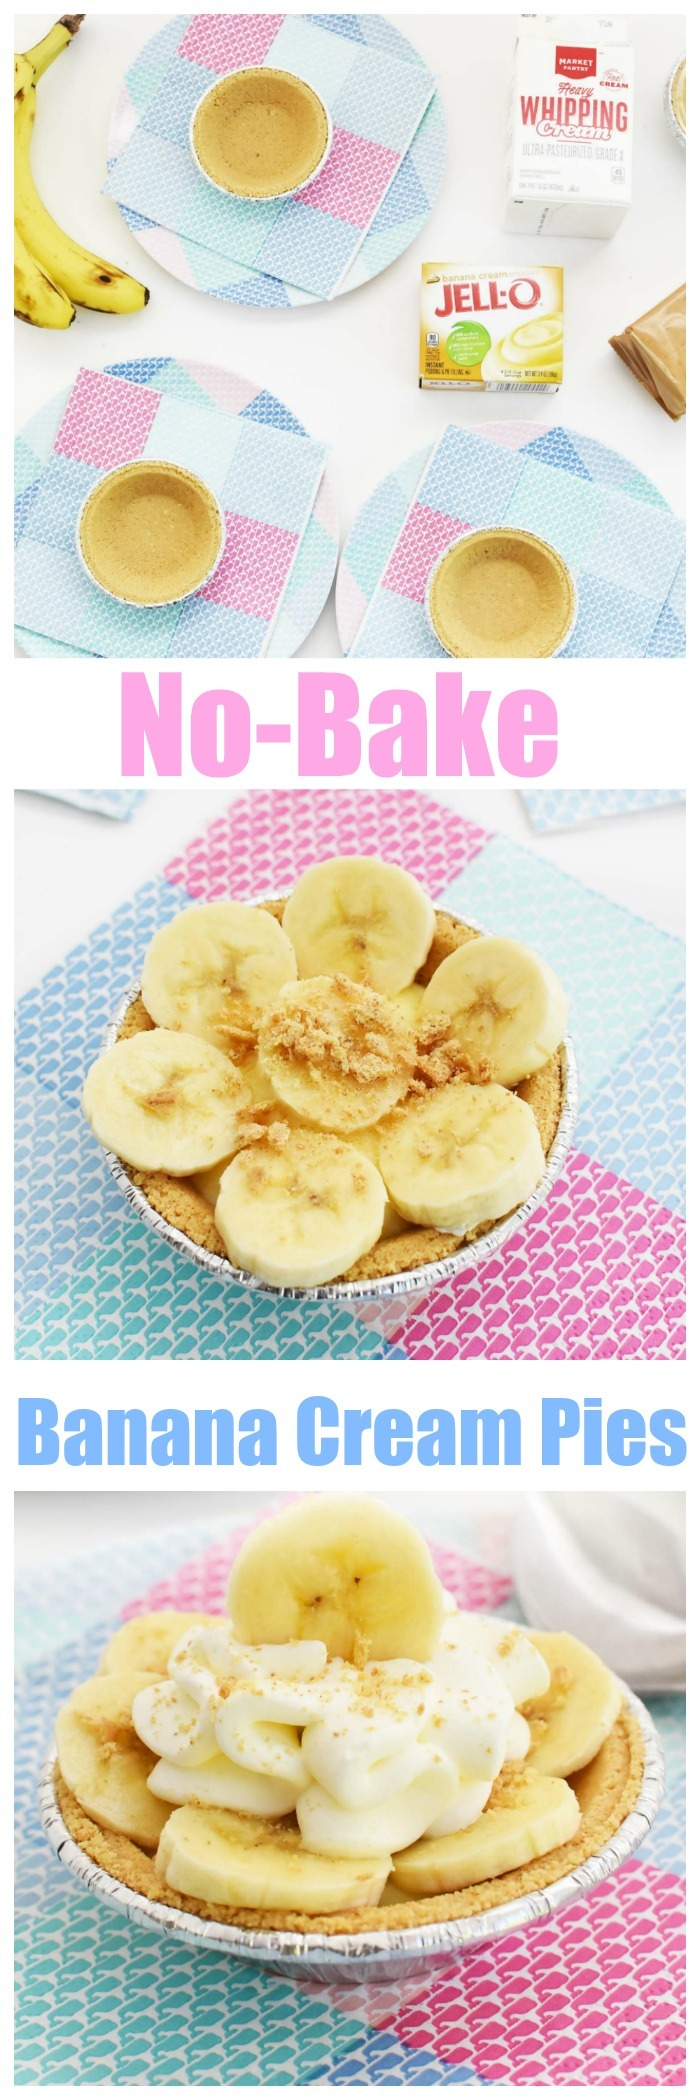 Mini Banana Cream Pies Recipe (No-Bake and Easy)